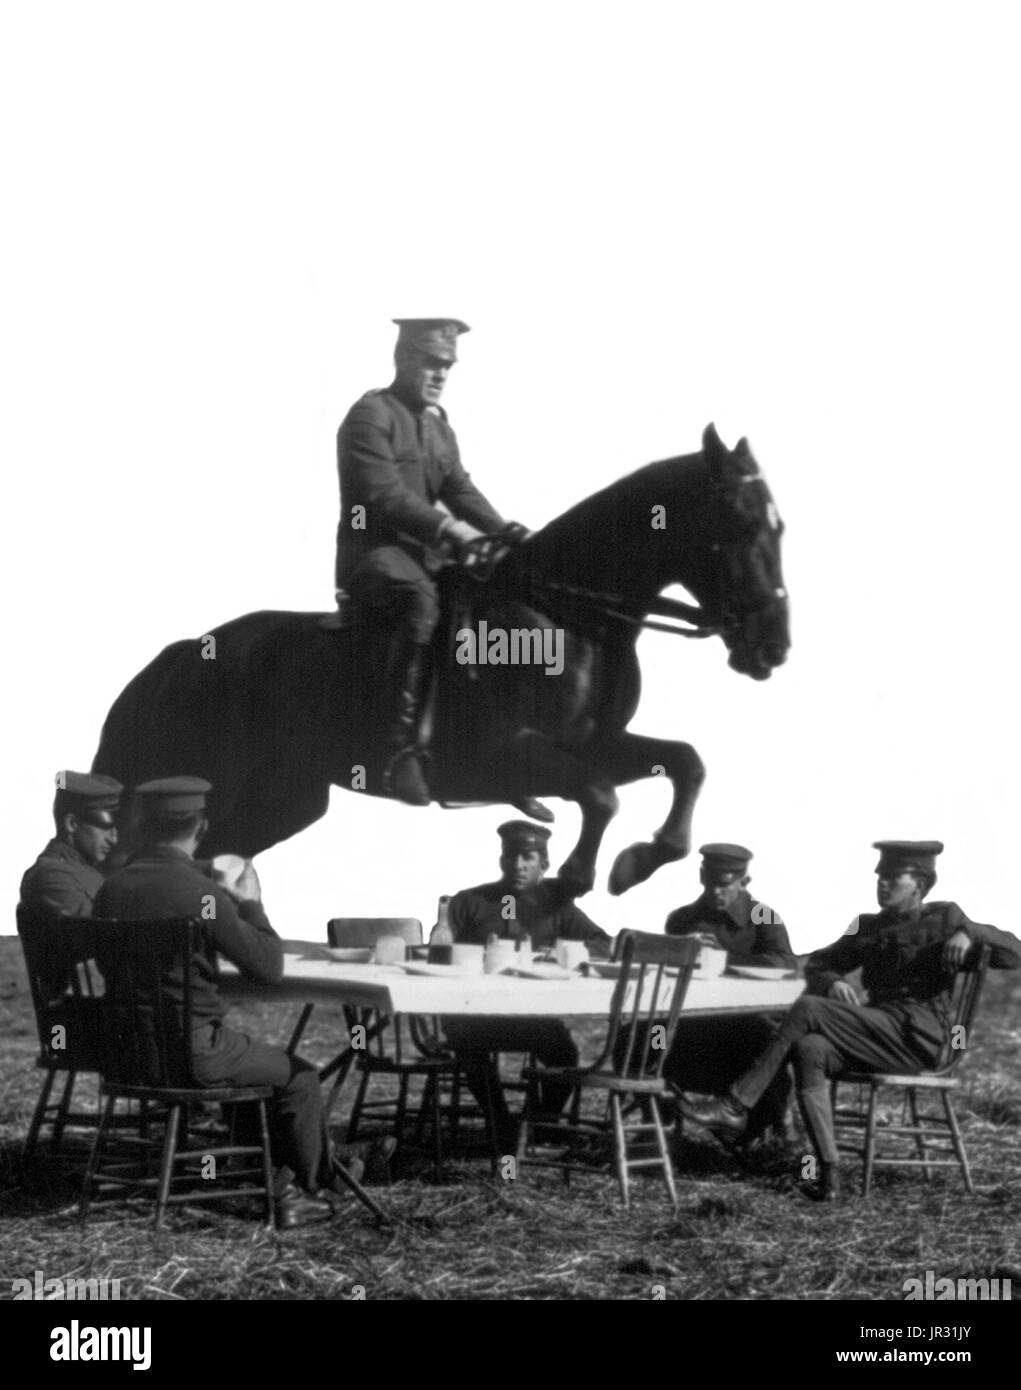 Us Cavalry Stock Photos Amp Us Cavalry Stock Images Alamy